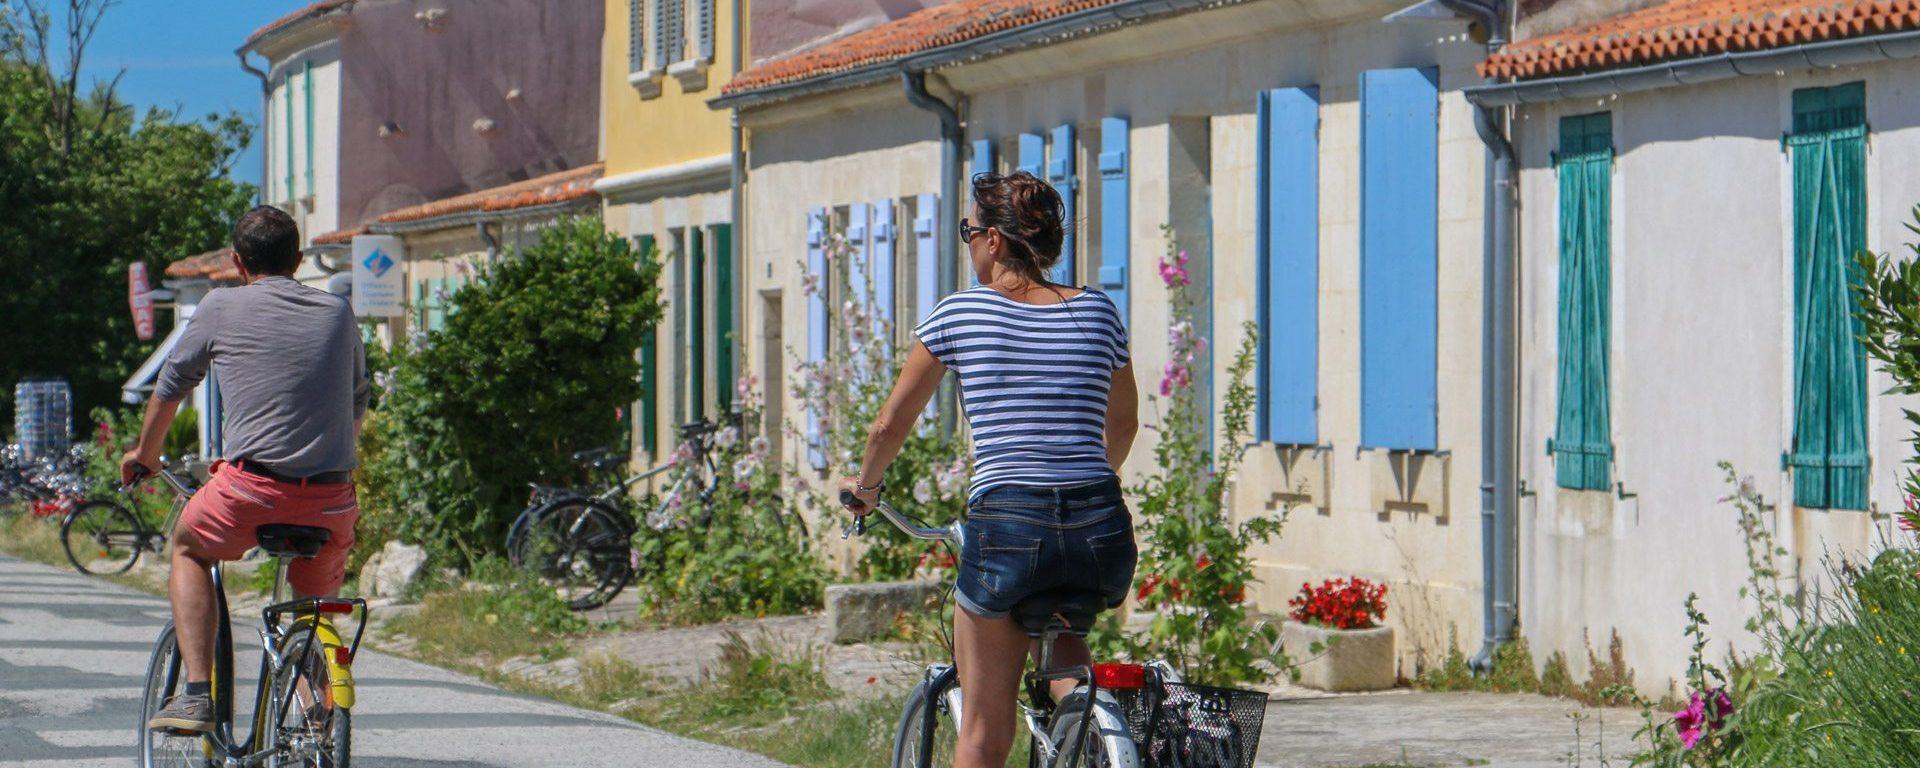 rochefort-ocean-ile-aix-village-velojulie-paulet1-aspect-ratio-2000-800